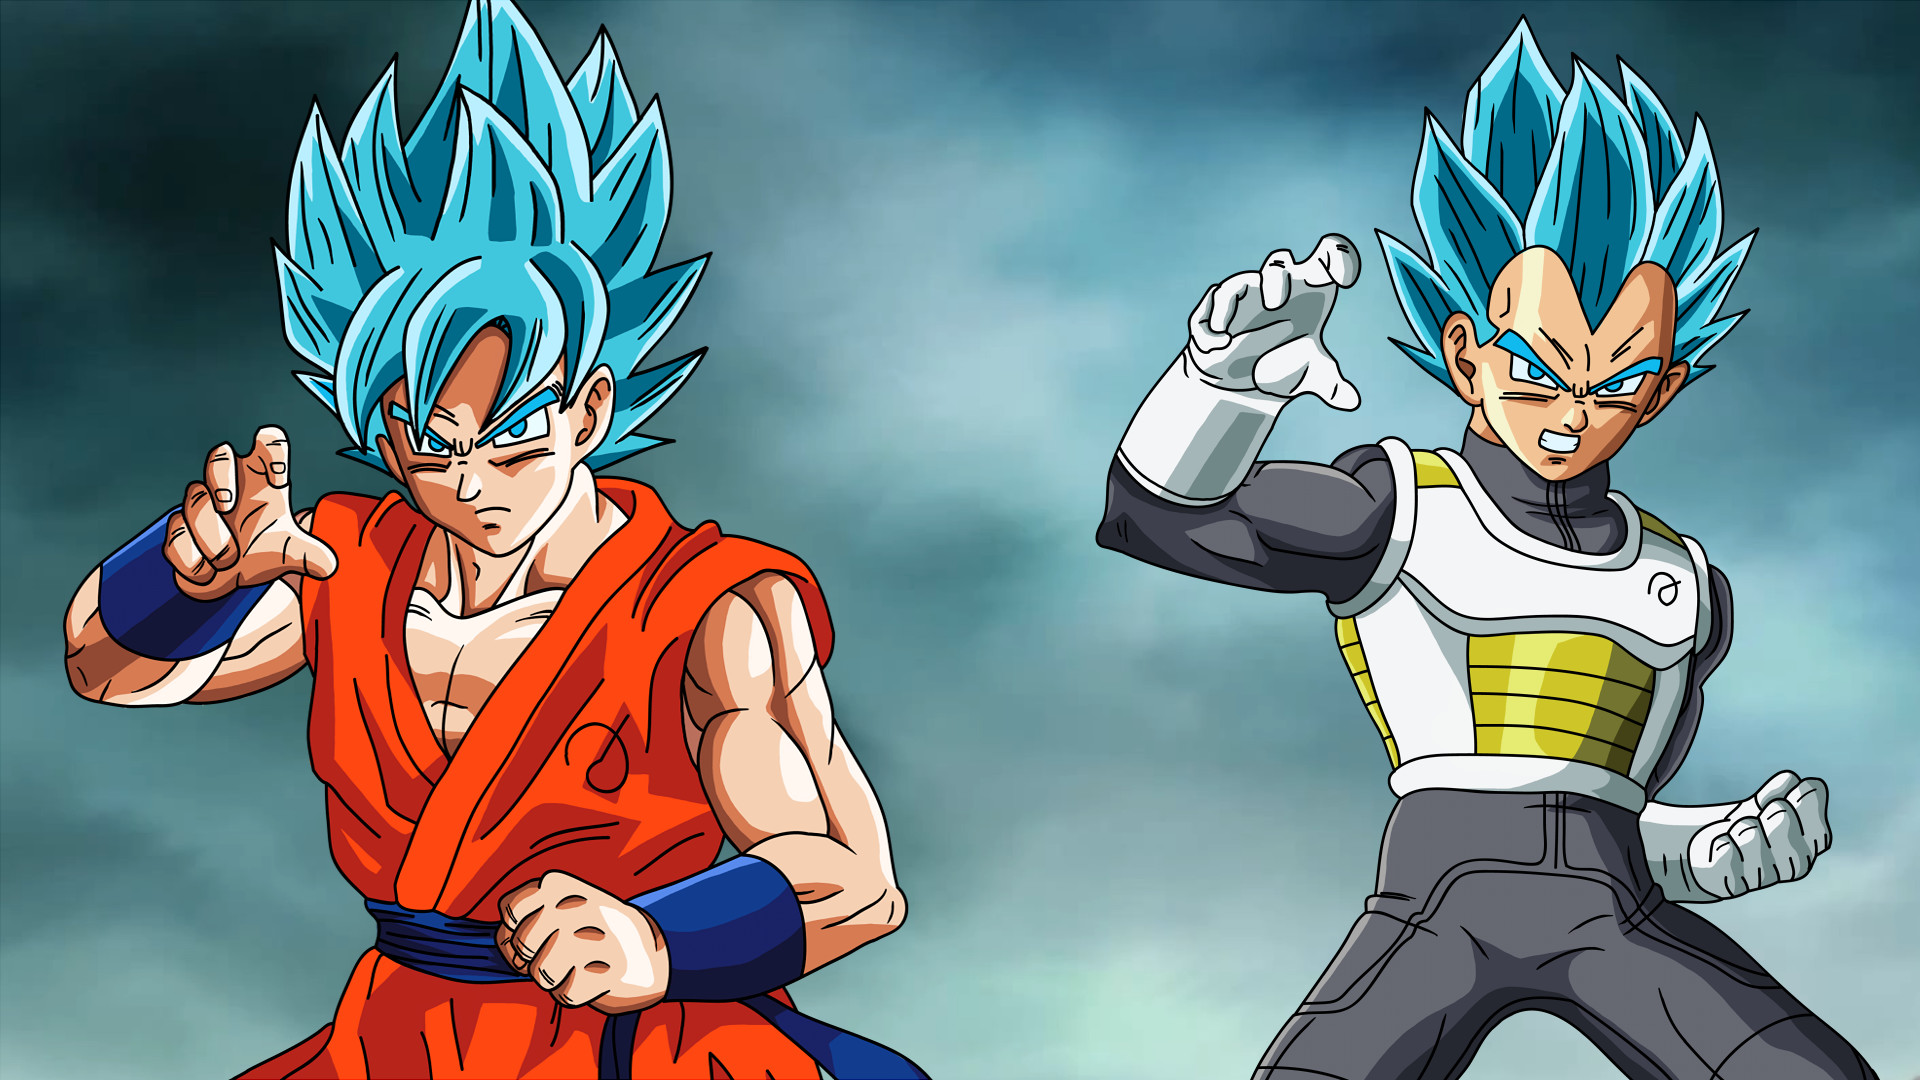 Goku and Vegeta Fukkatsu no F SSJGod SS Wallpaper by EymSmiley on .